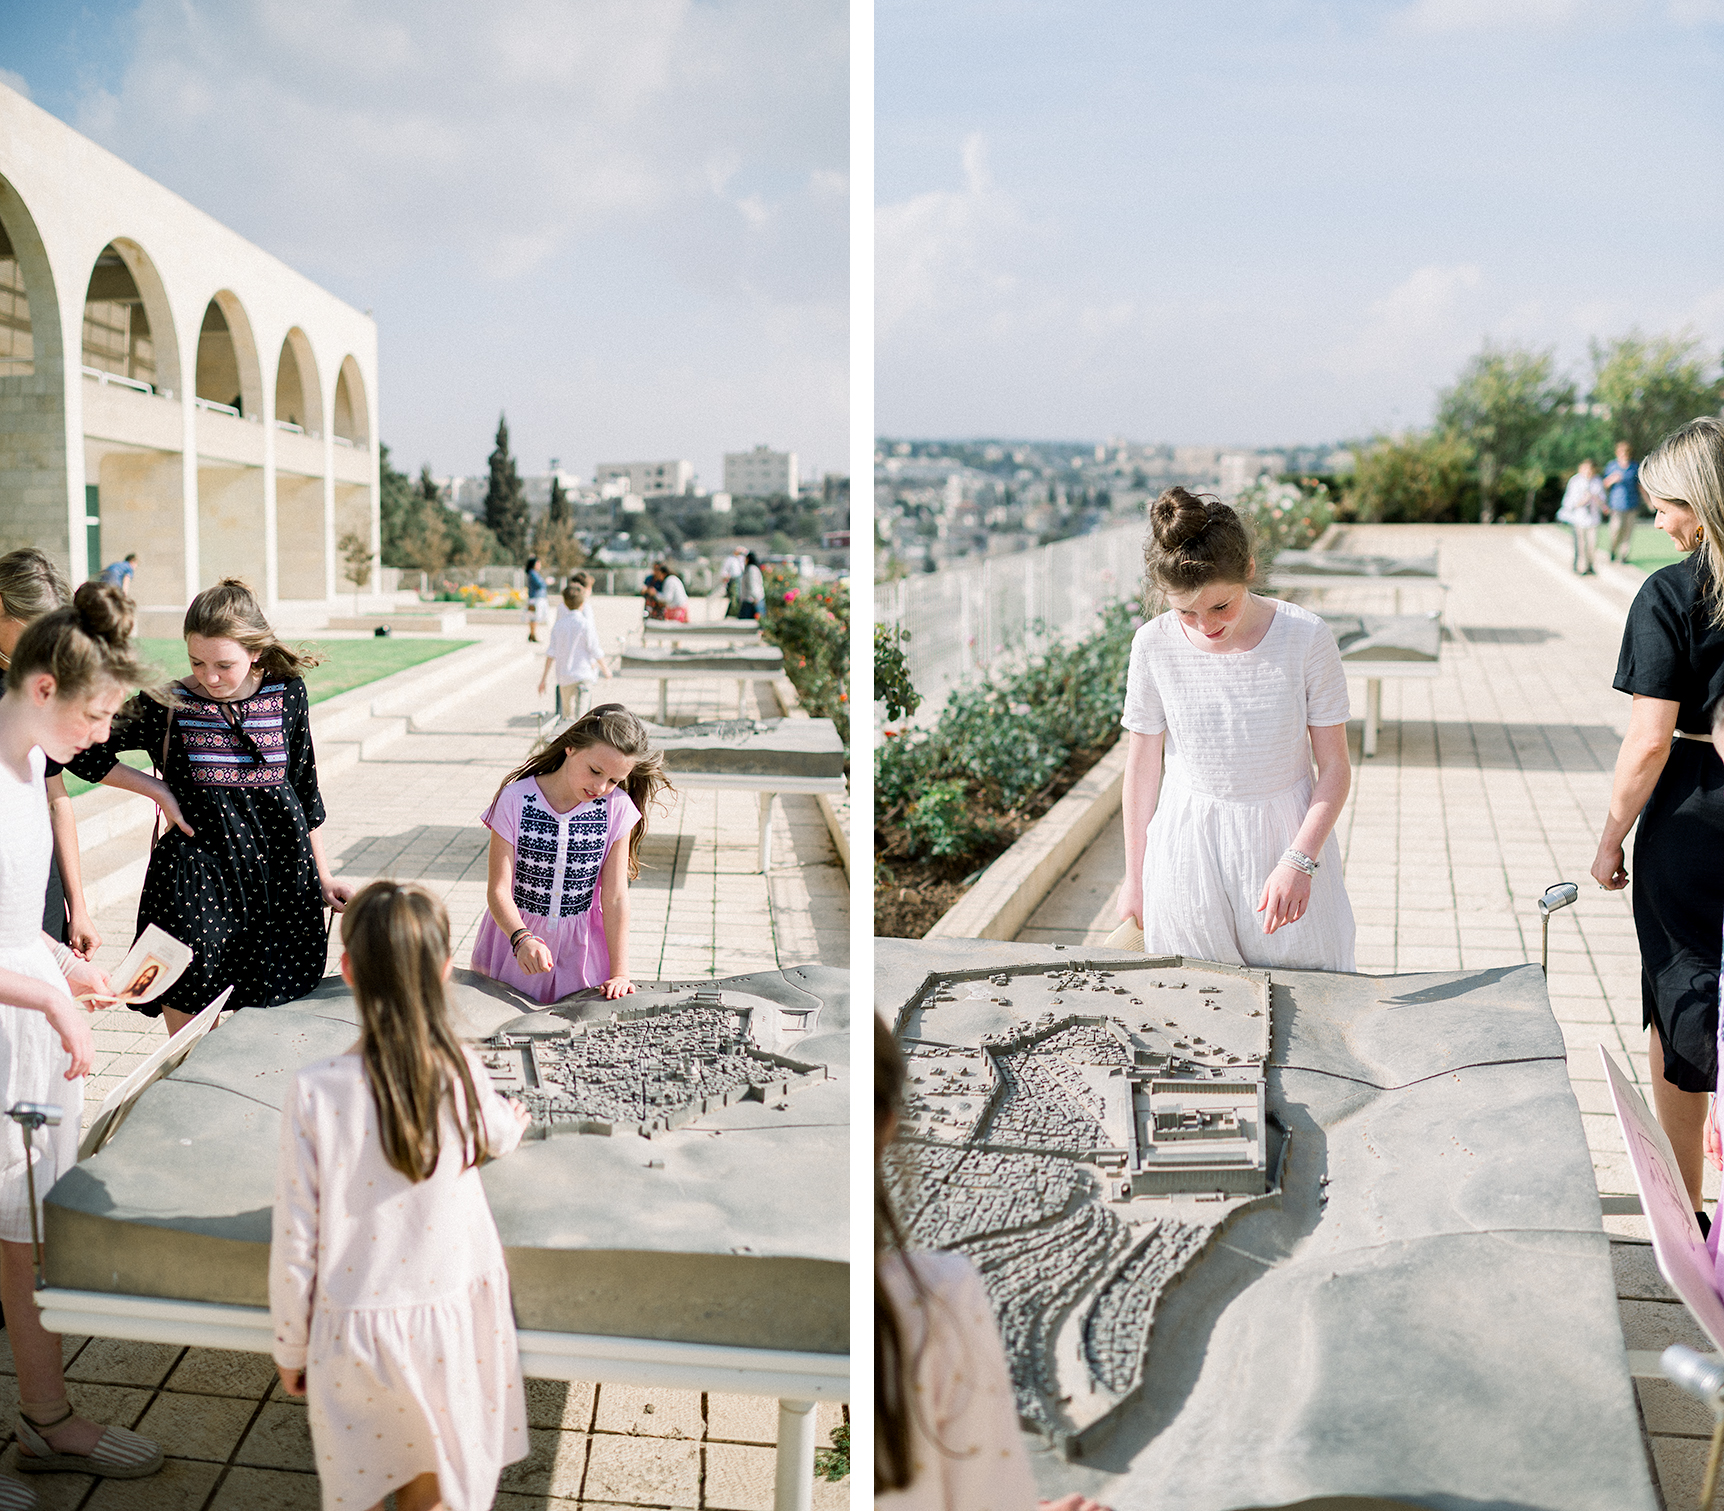 20181020_JERUSALEM_x004.jpg